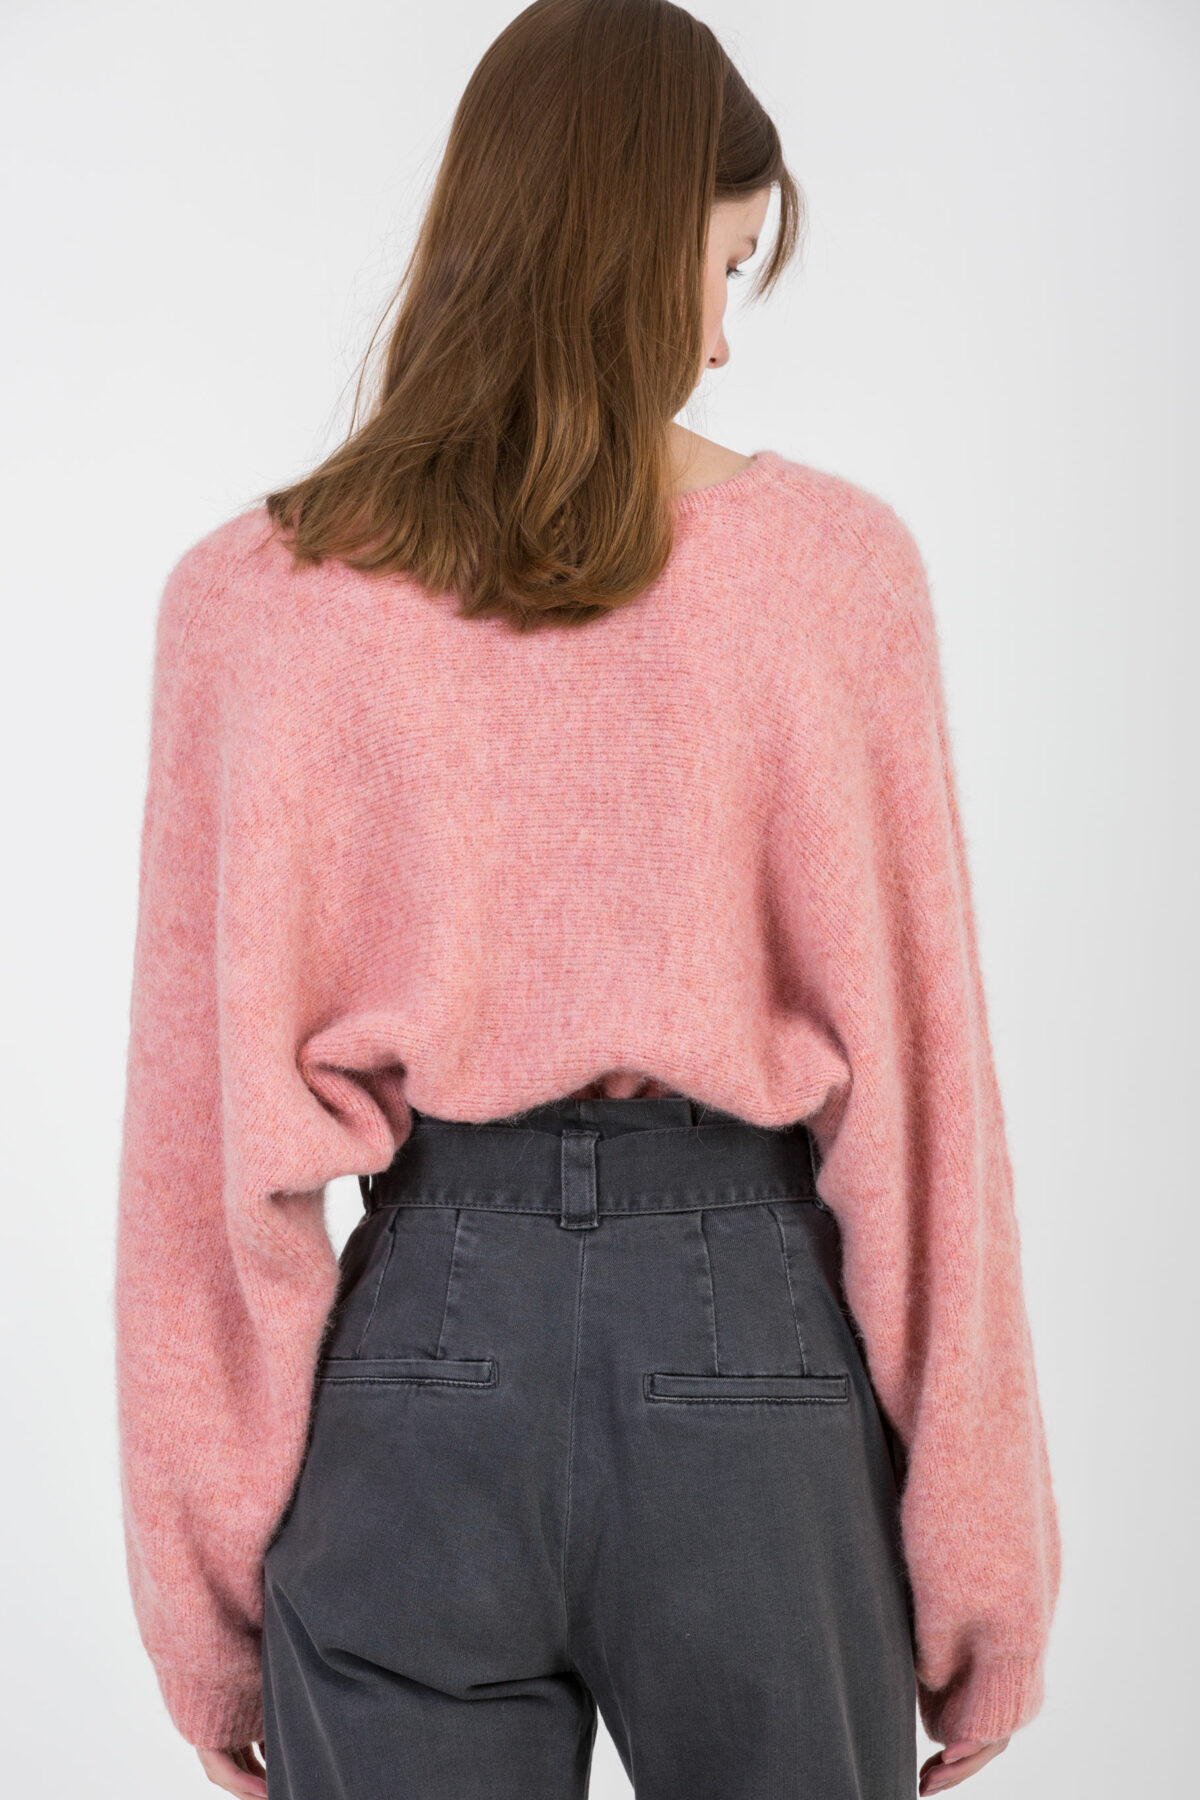 east-pink-sweater-wool-american-vintage-matcboxathens